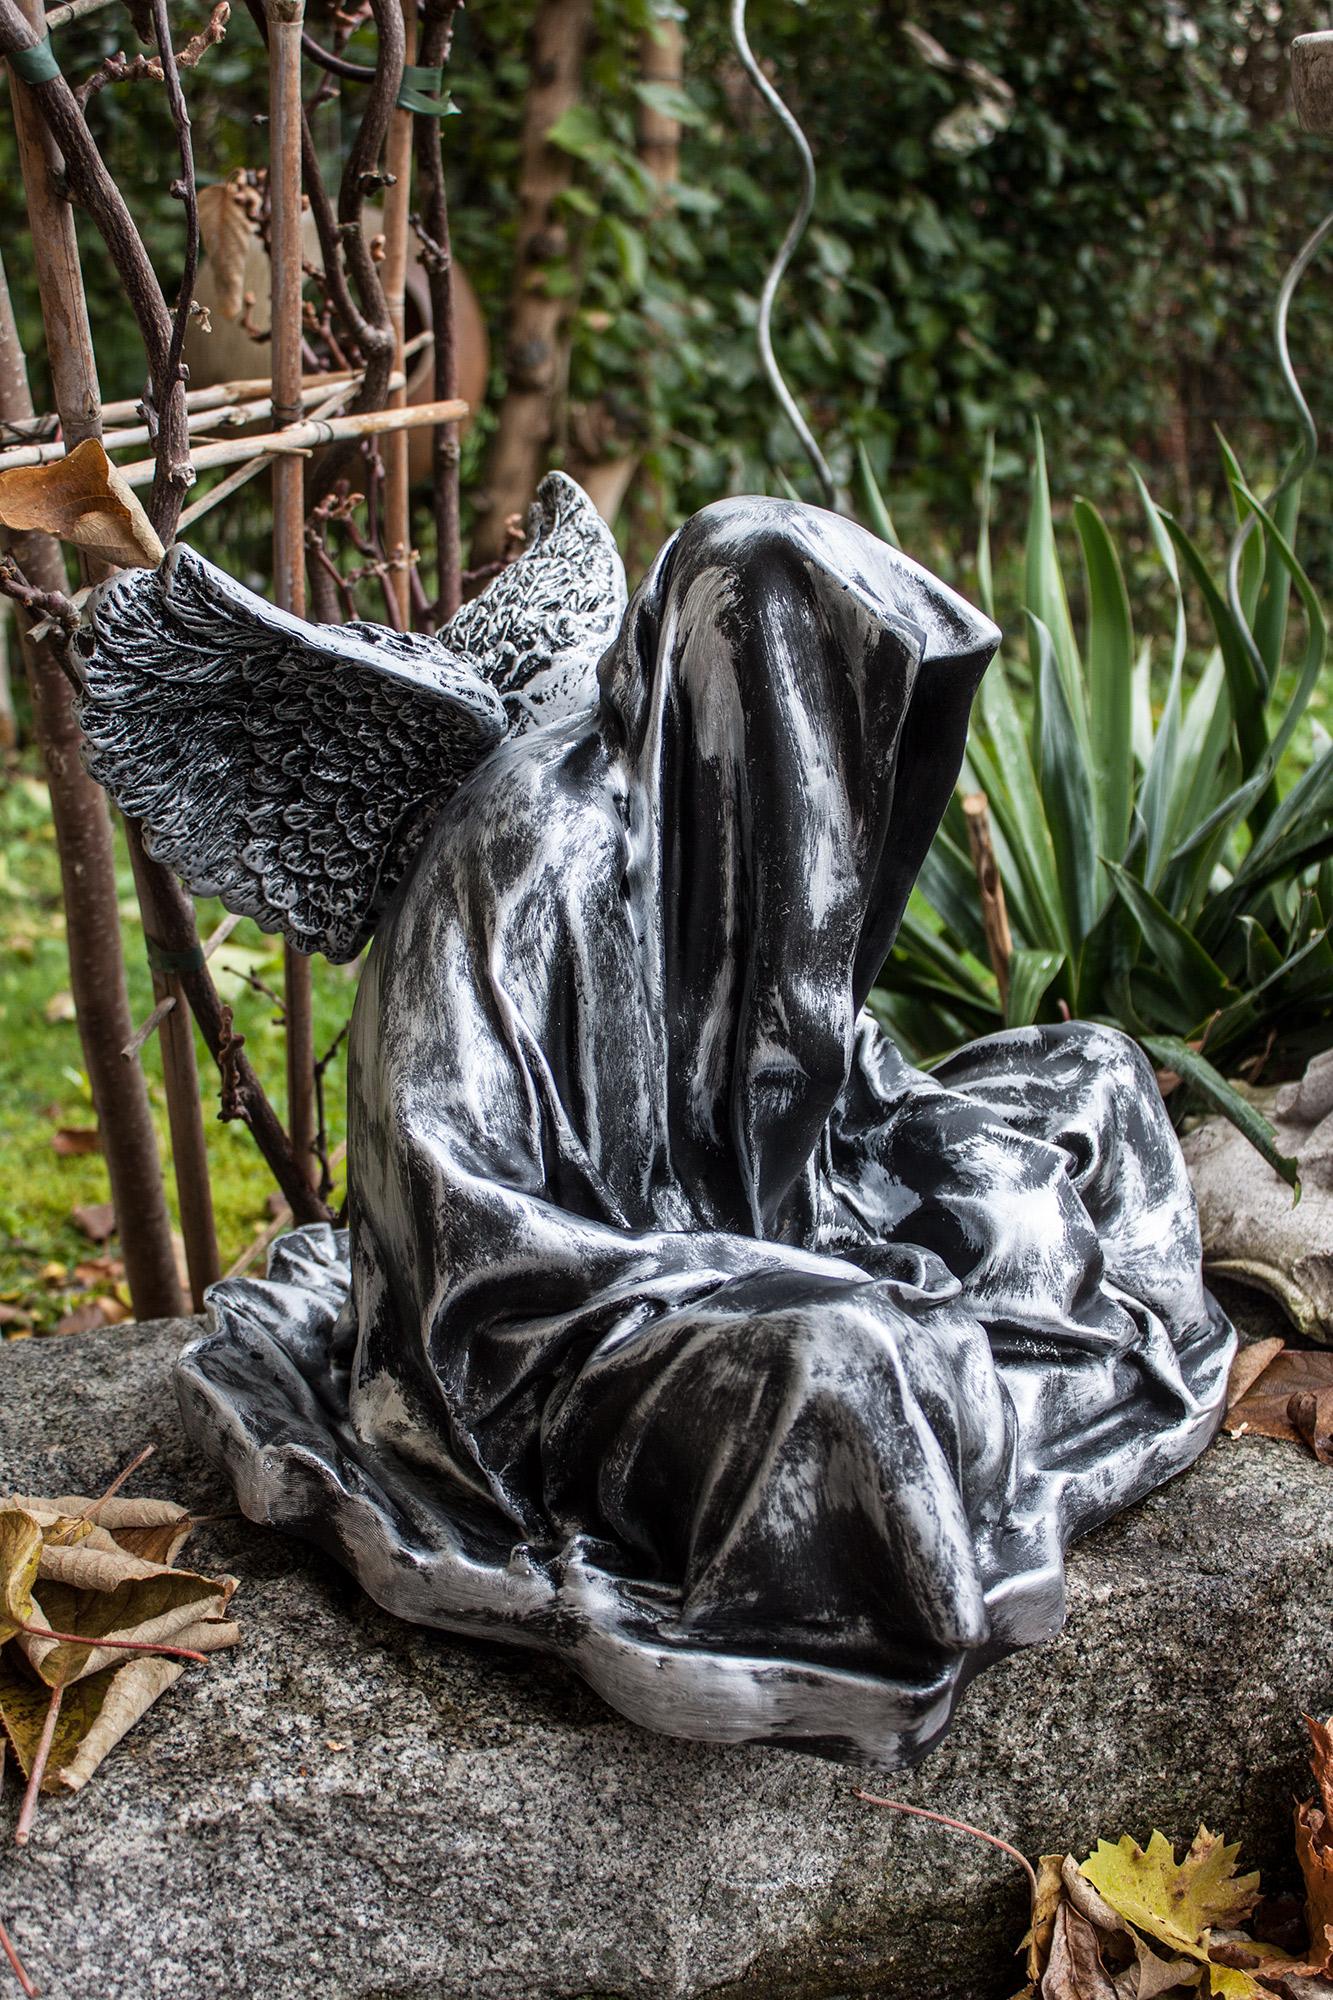 engel-guardians-of-time-ghost-wing-faceless-fine-art-contemporary-arts-modern-design-manfred-kielnhofer-kili-sculpture-statue-1332